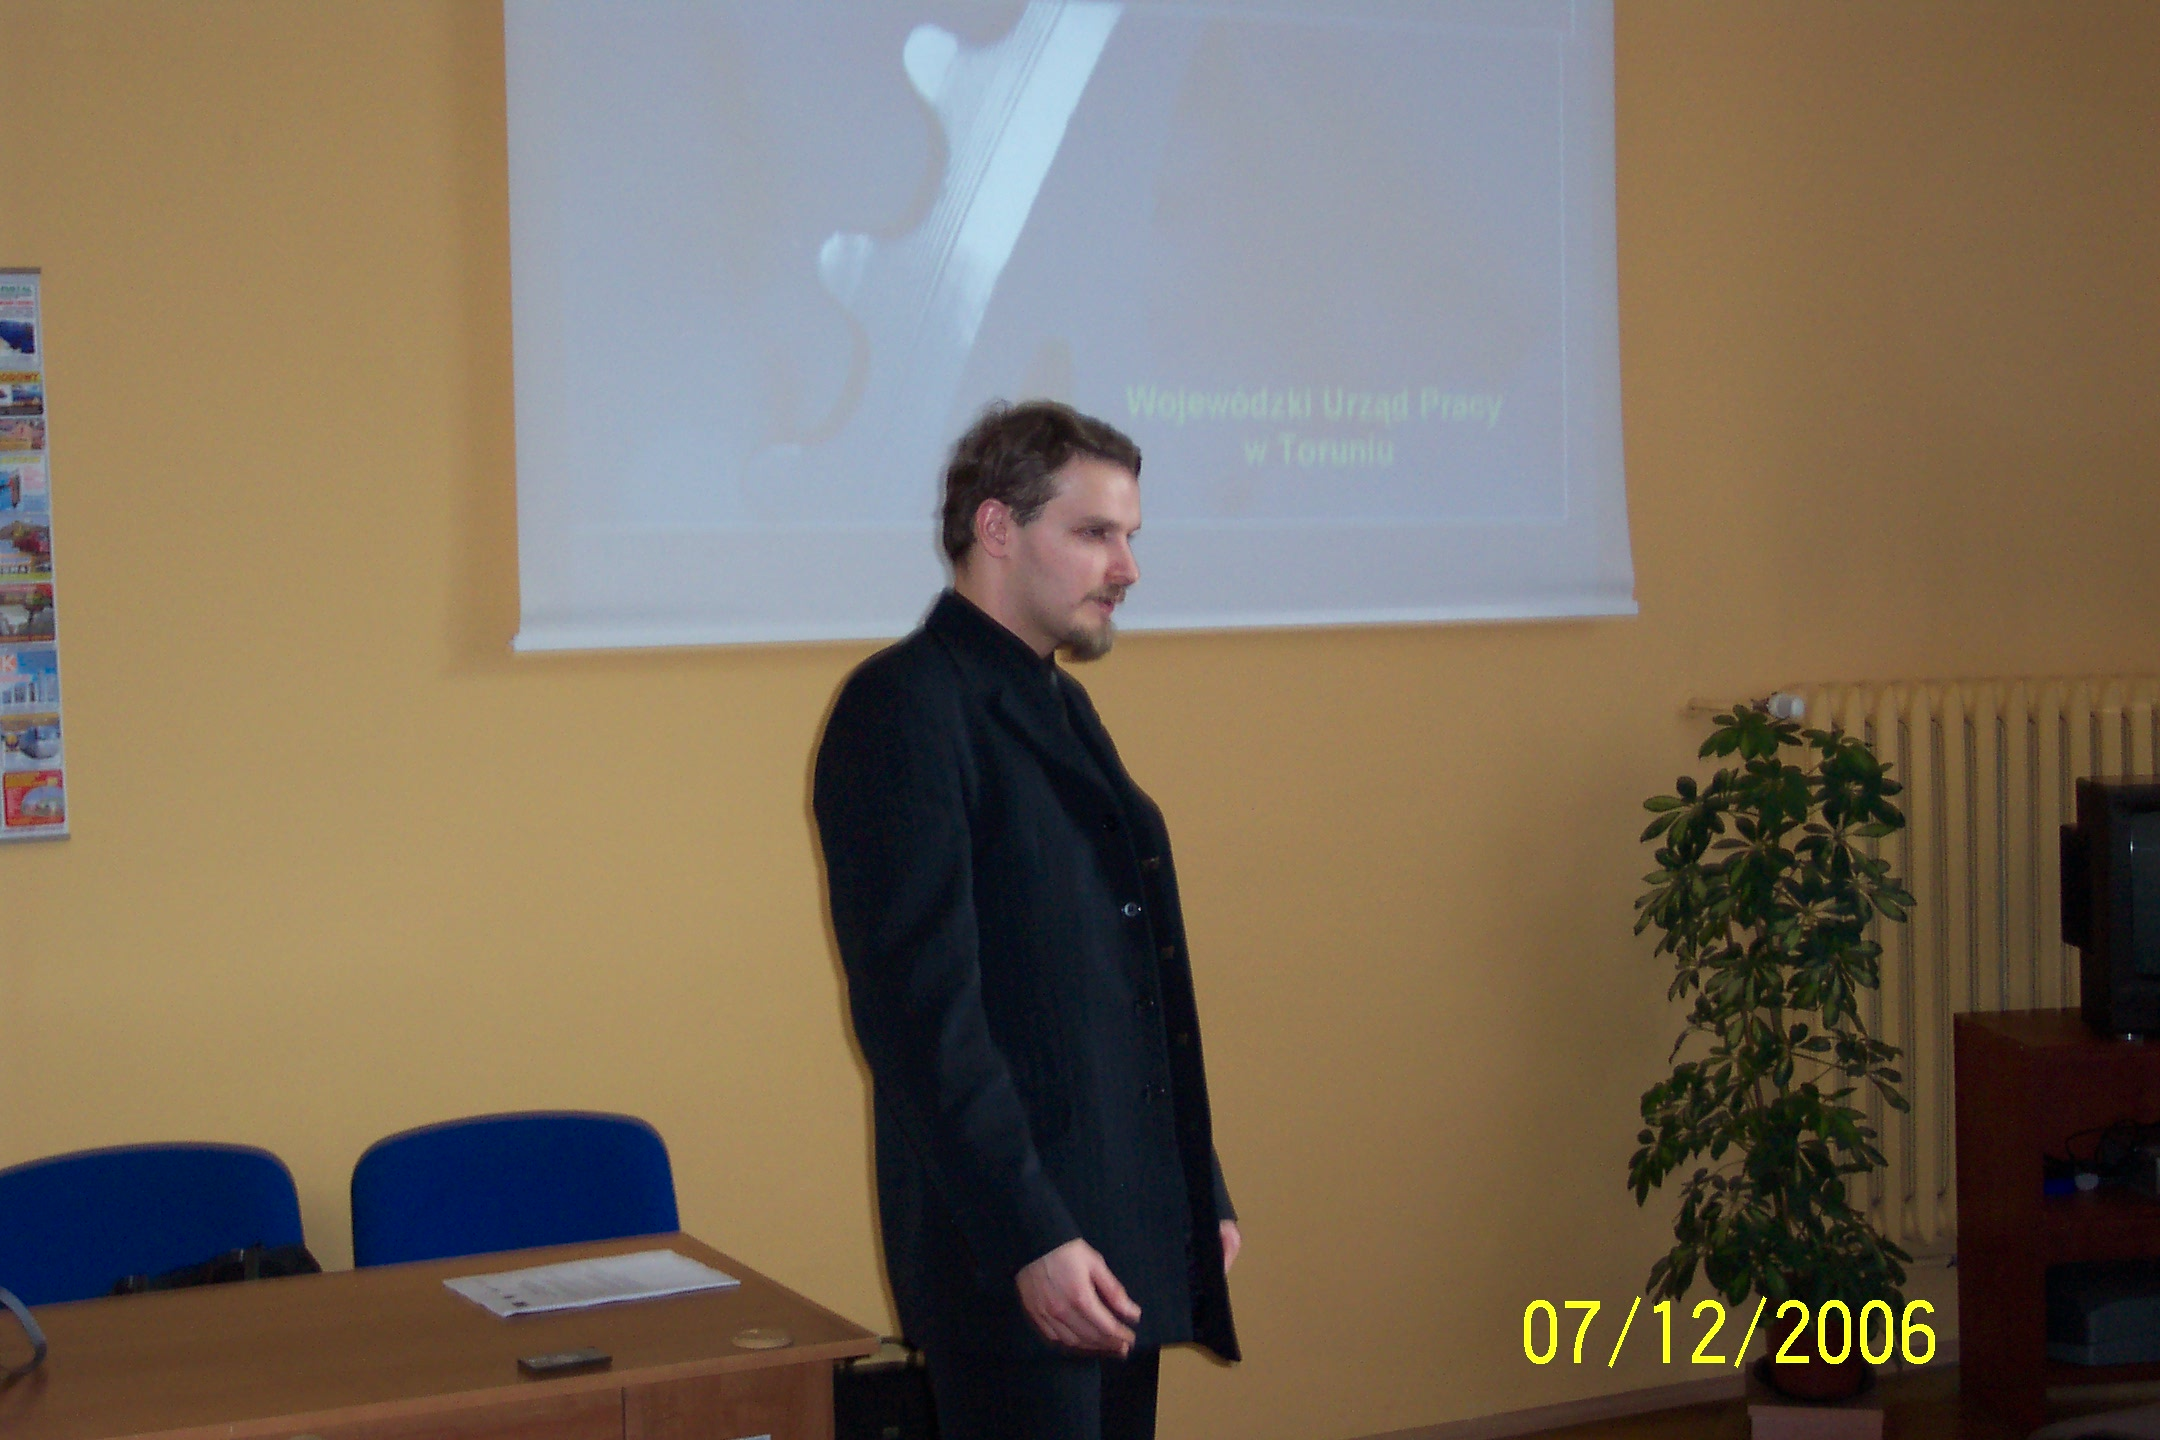 konferencja_06.12.2006_009